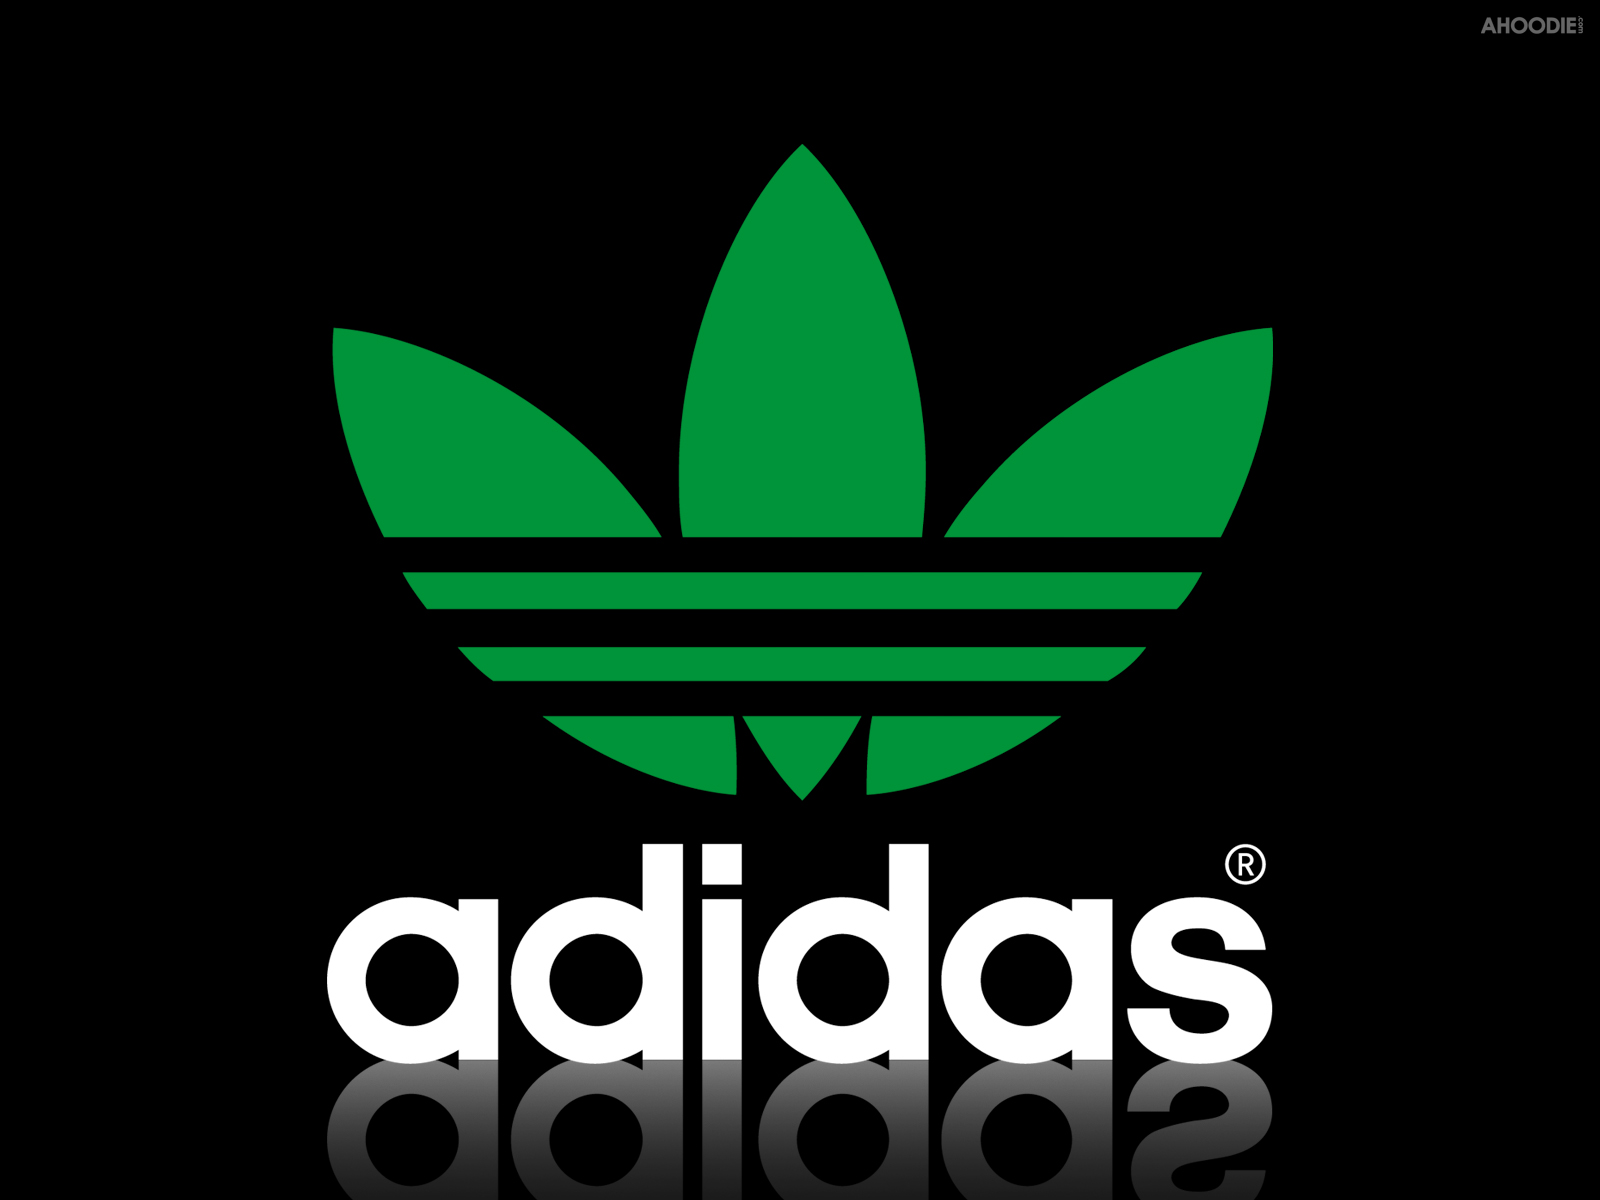 My Logo Pictures Adidas Logos 1600x1200